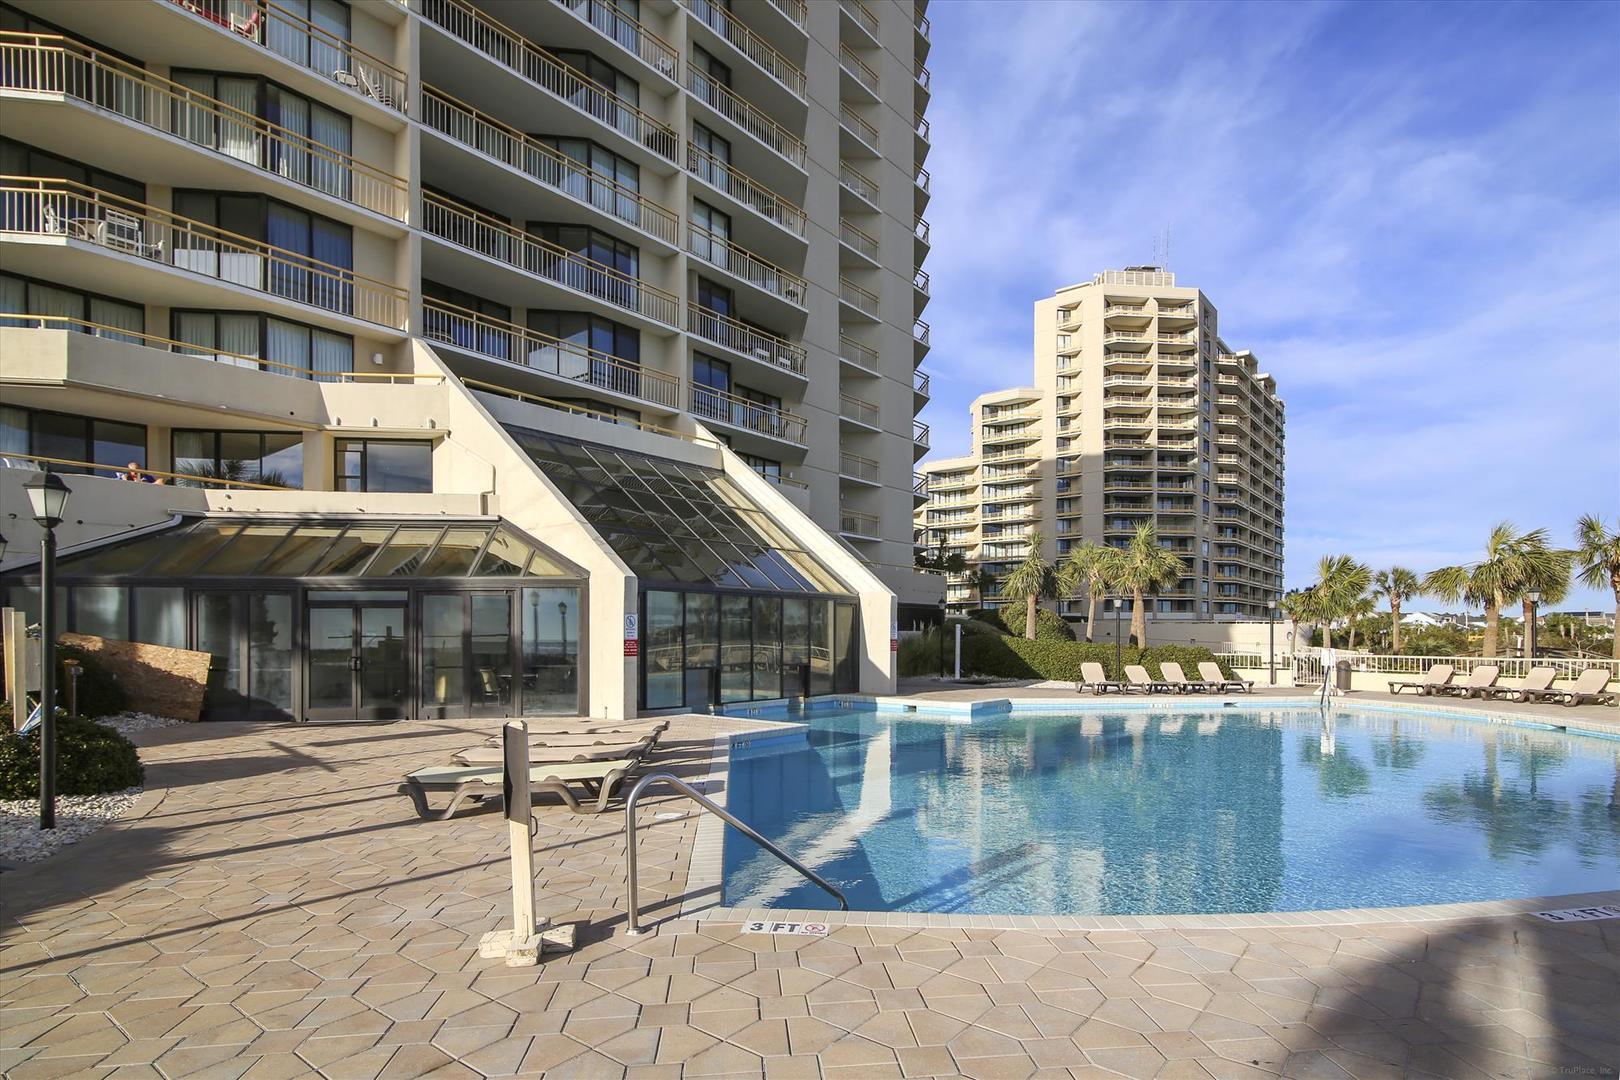 South Tower Outdoor Pool (open seasonally)